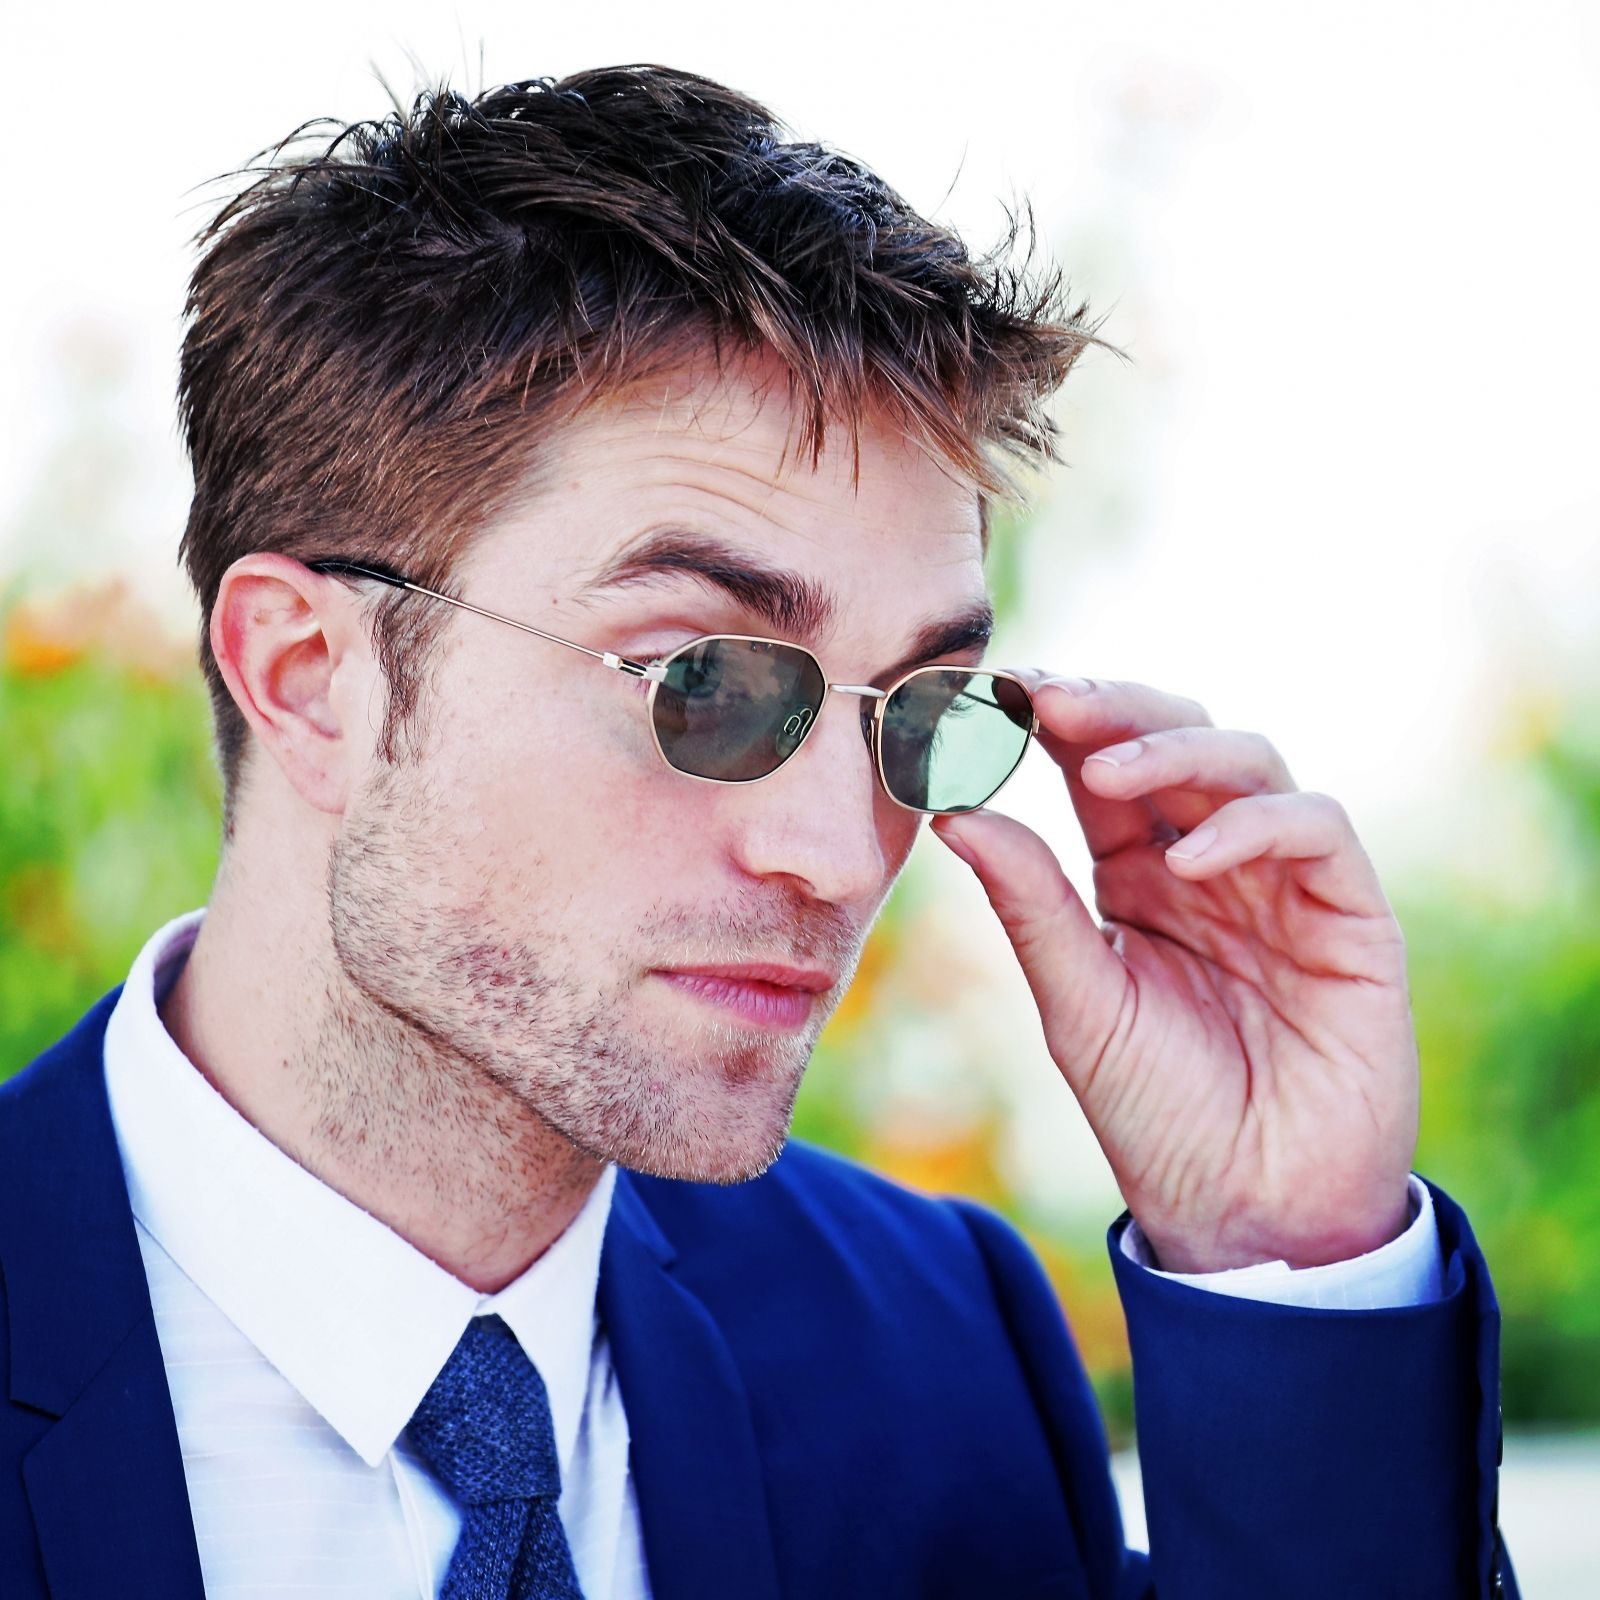 Anna Kendrick dating Robert Pattinson